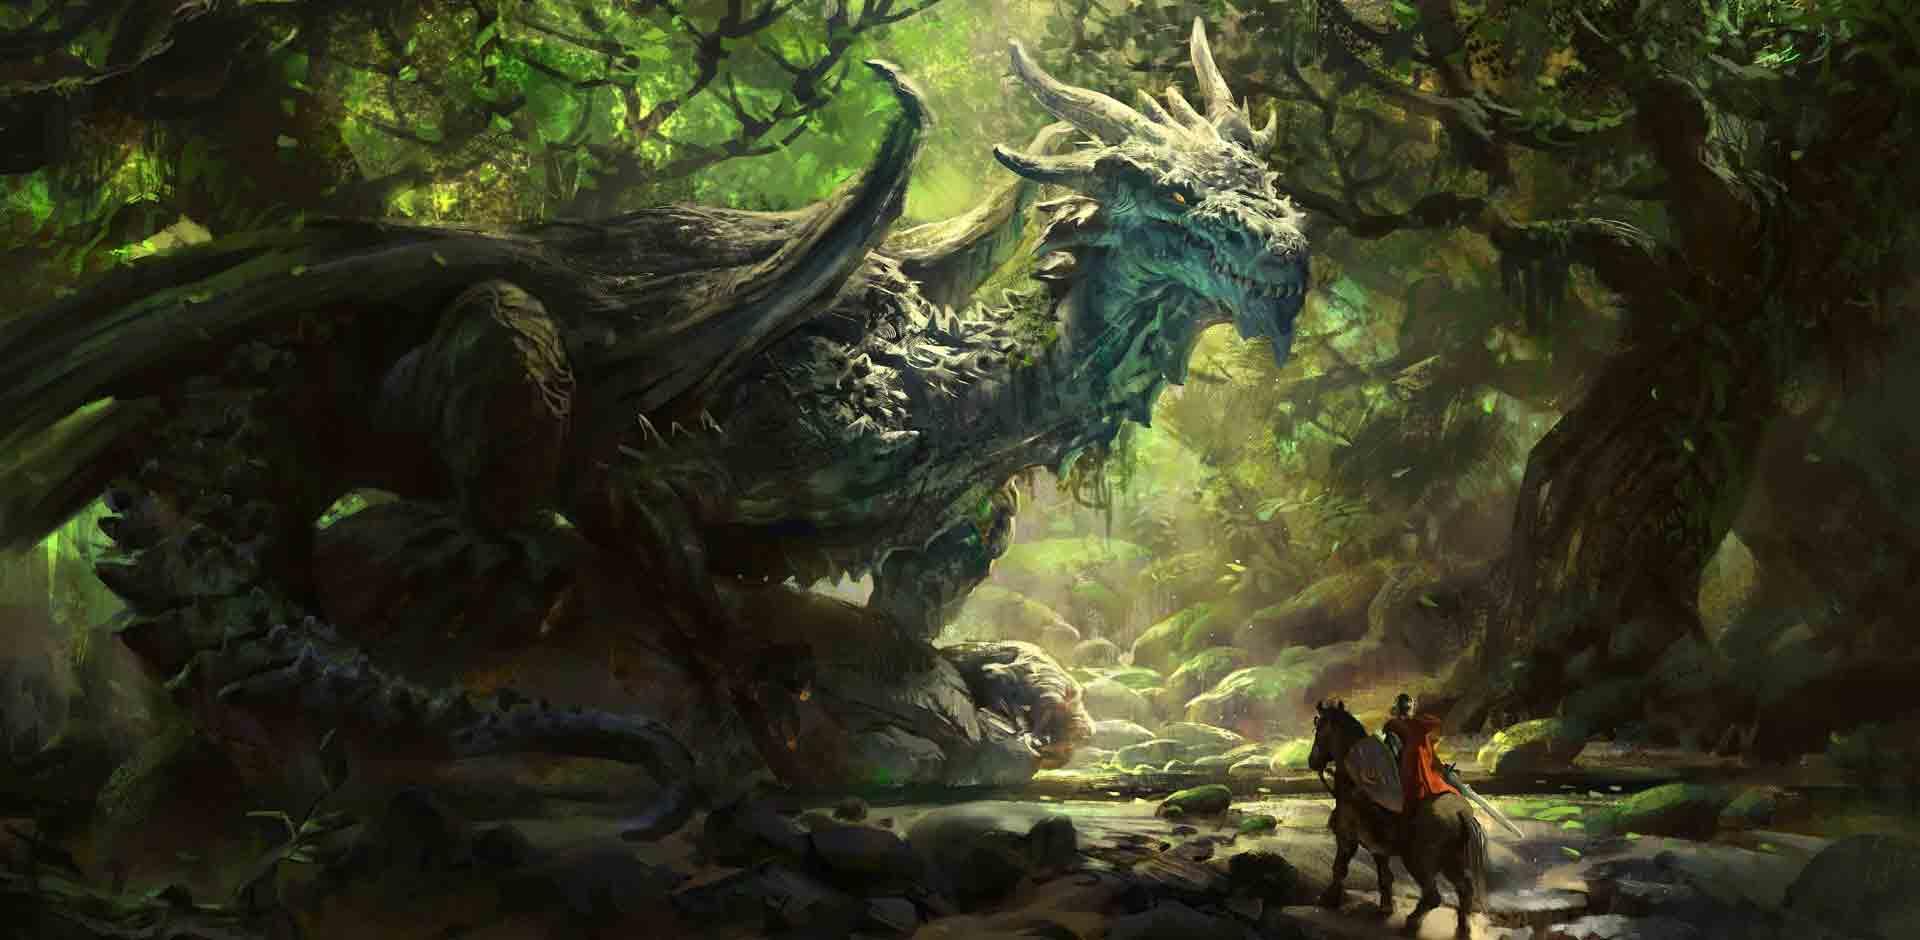 Mike Azevedo - Joseph Ancient Dragon